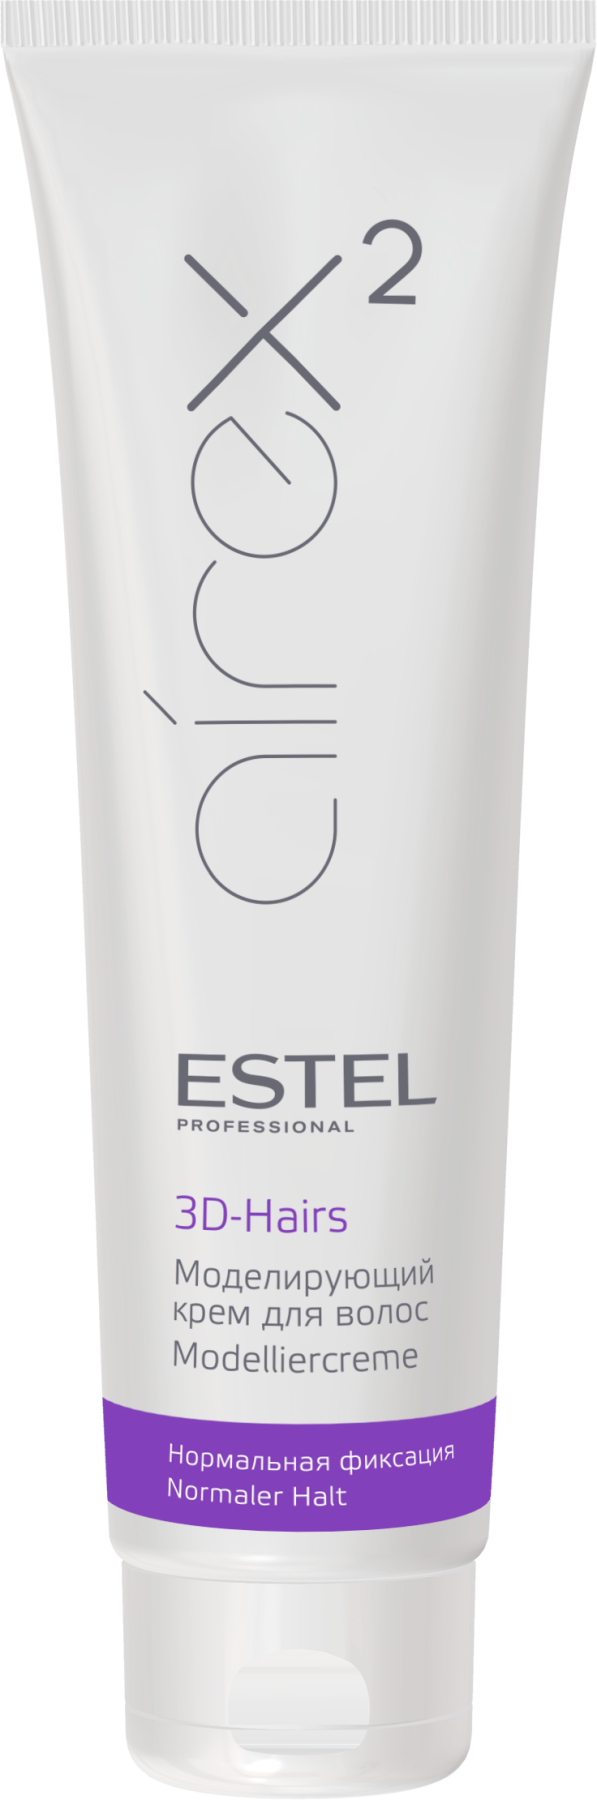 ESTEL PROFESSIONAL Крем моделирующий для волос / Airex 3D-Hairs 150 мл